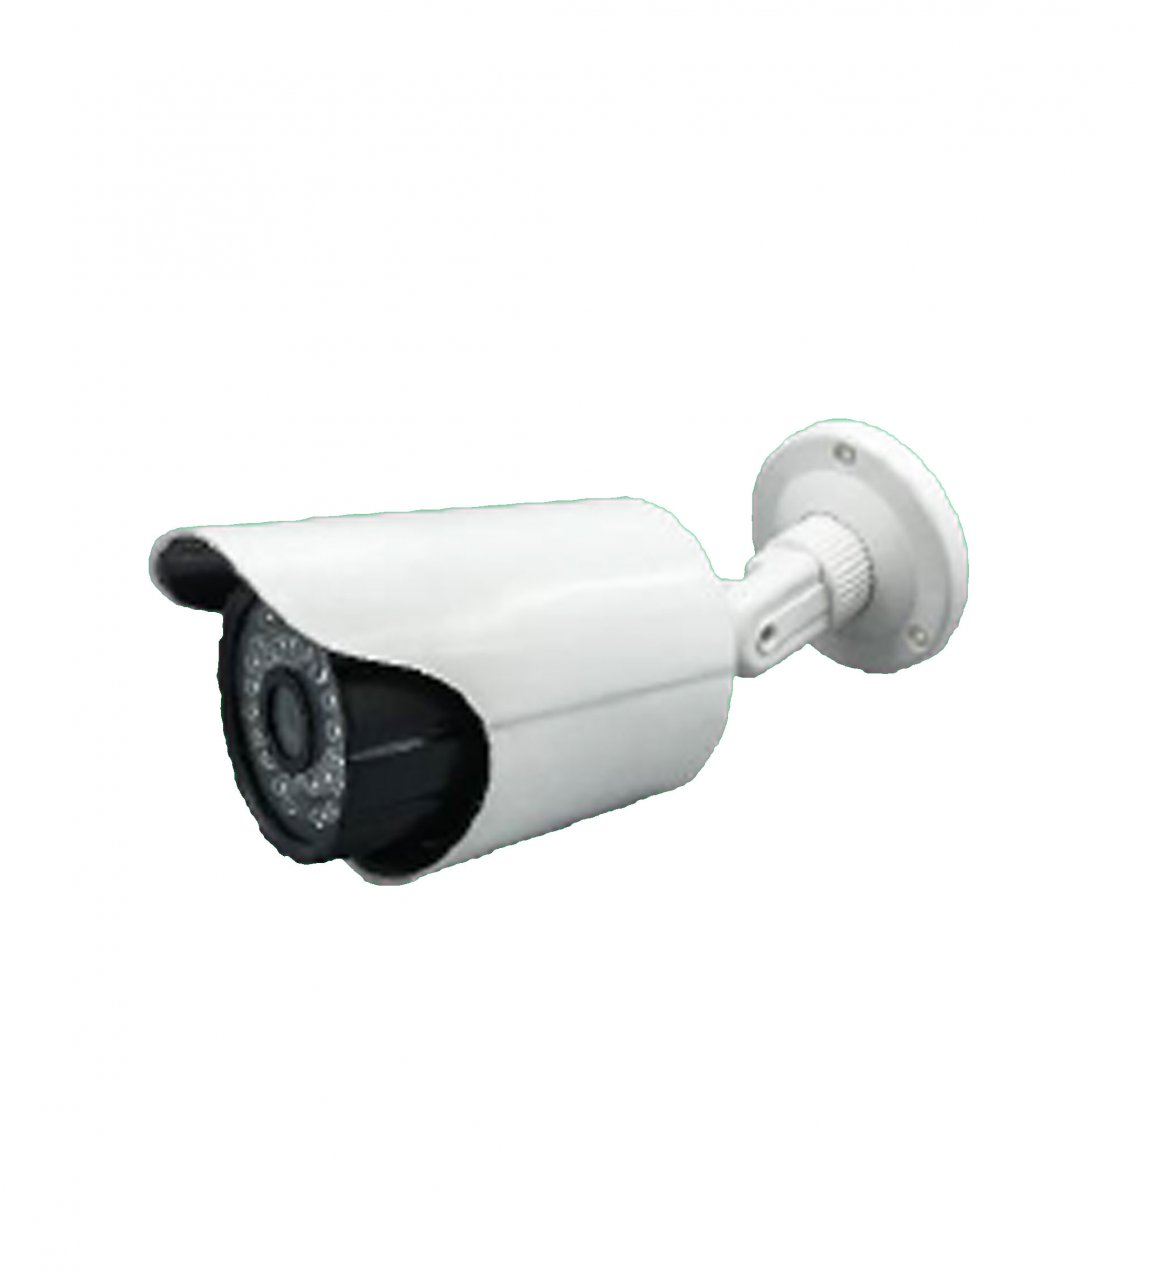 دوربین مداربسته 2 مگاپیكسل AHD مدل LX-1823